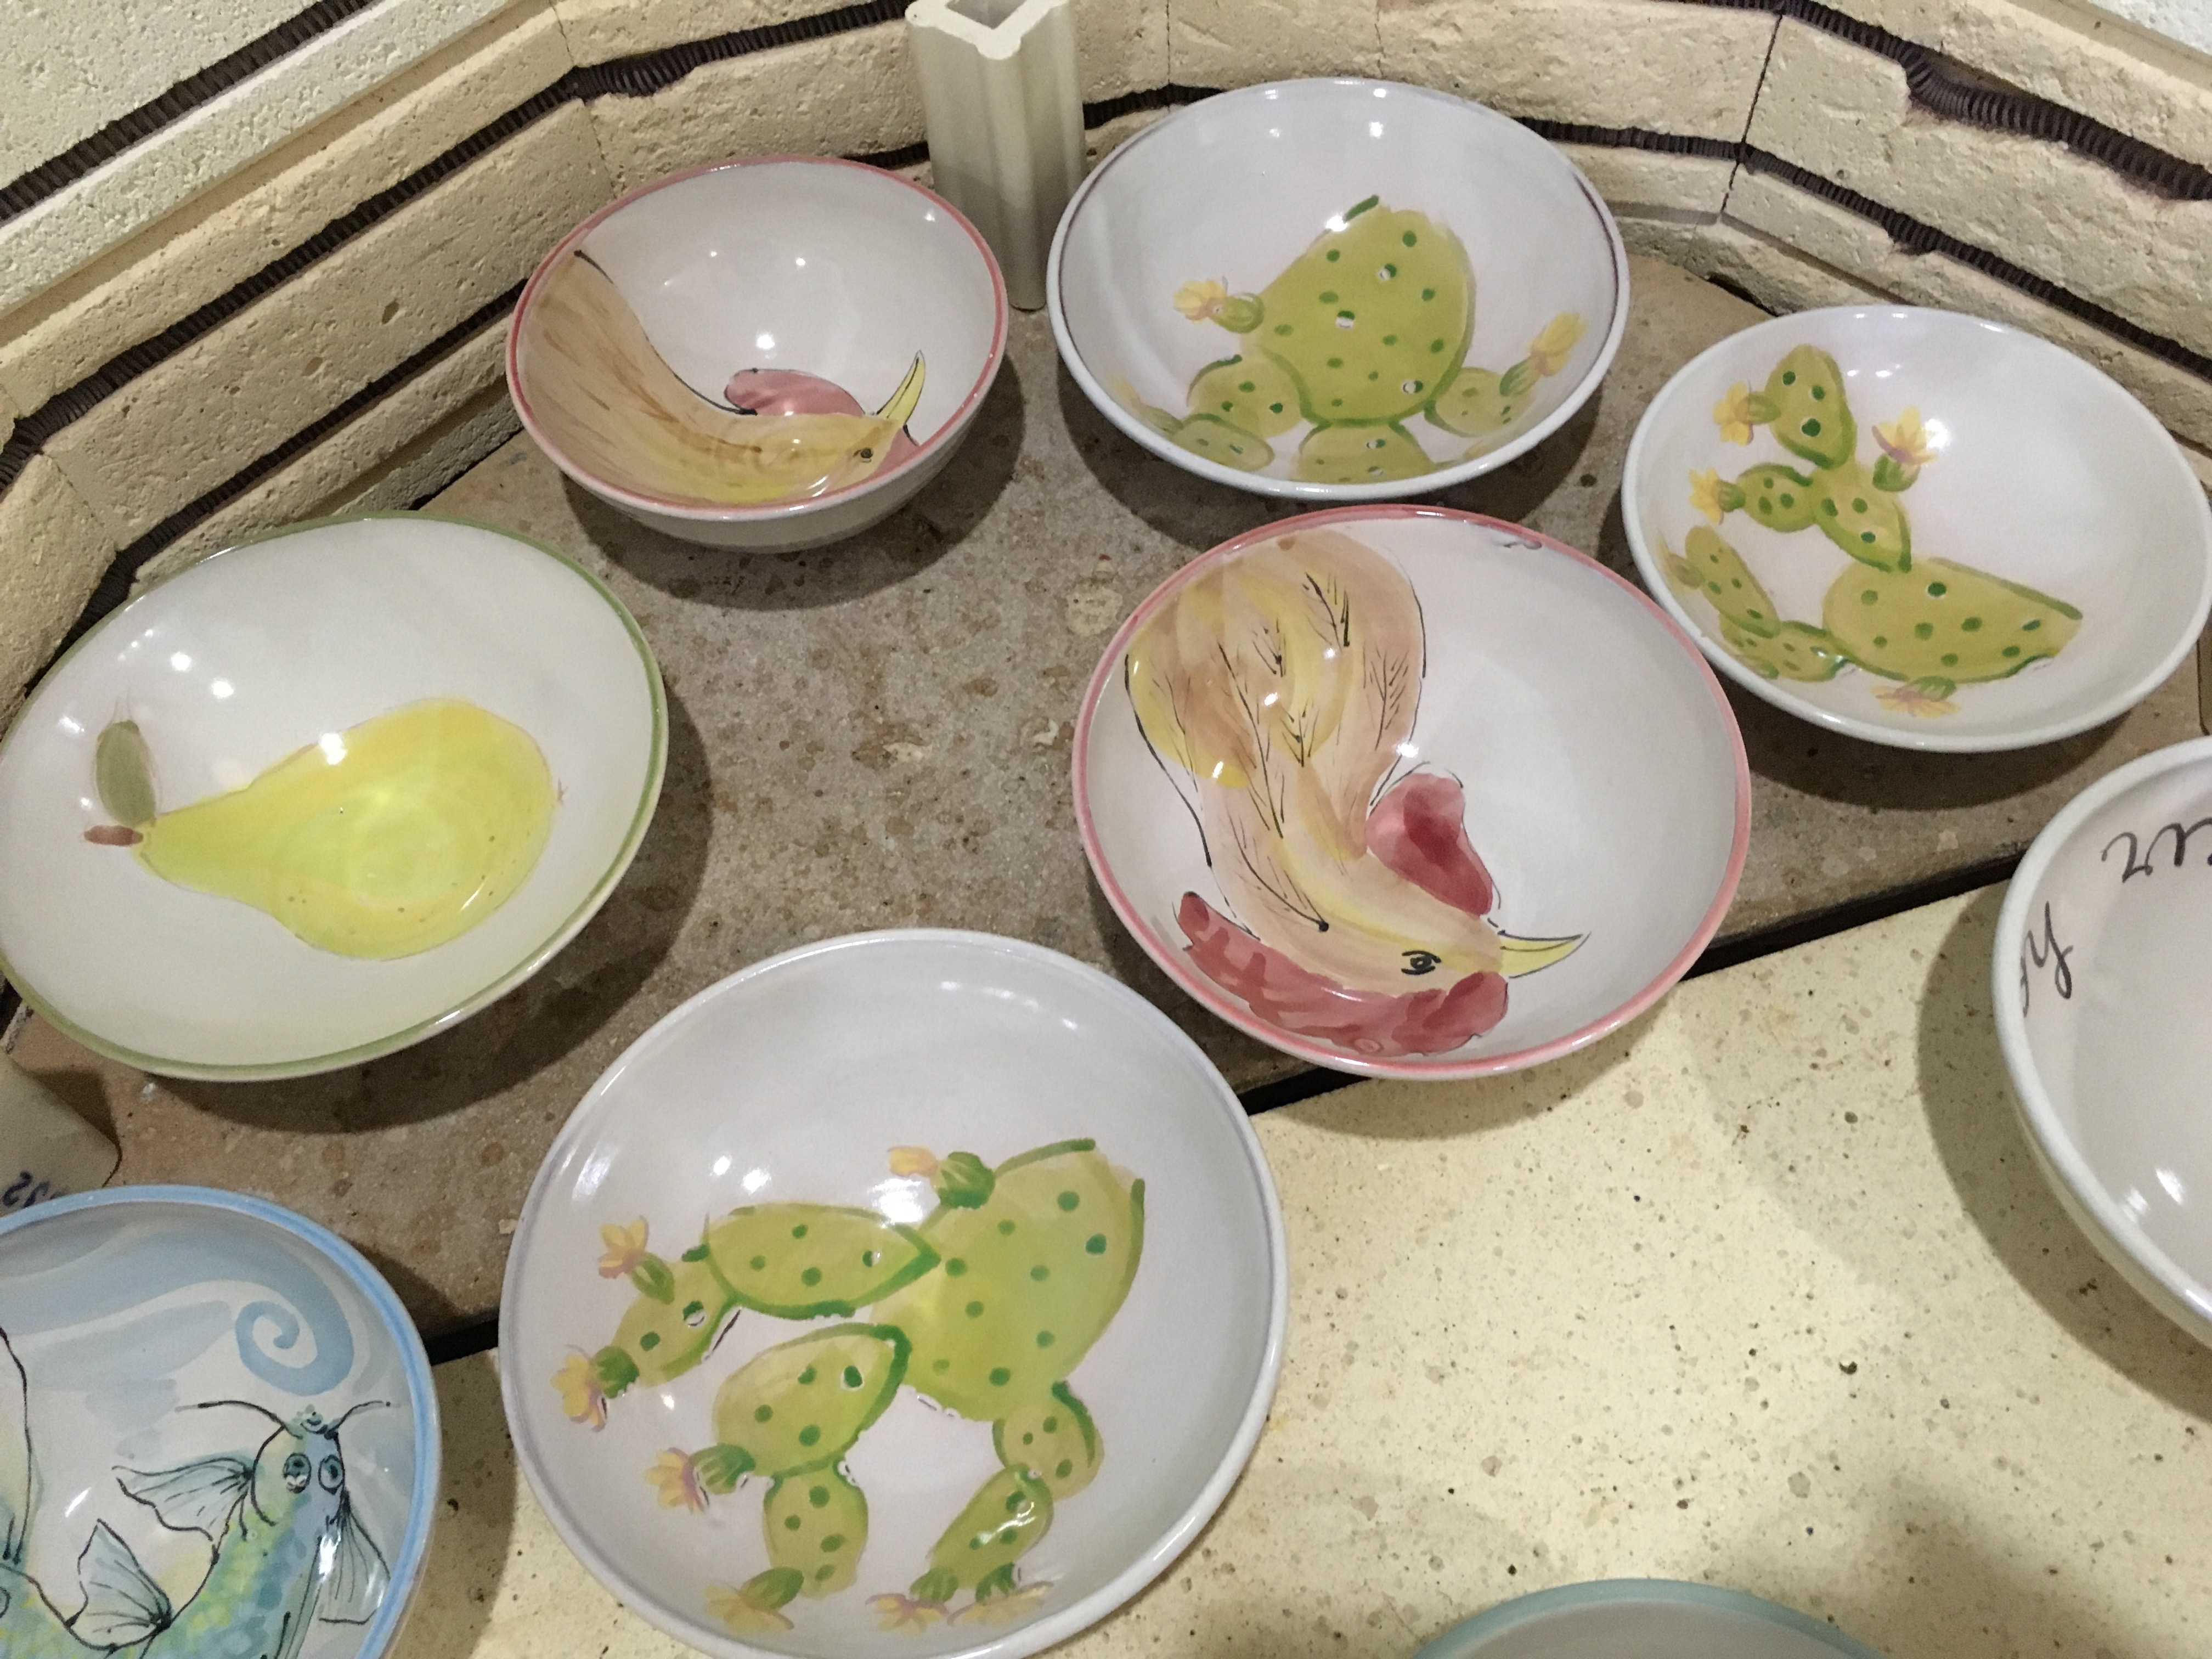 More bowls